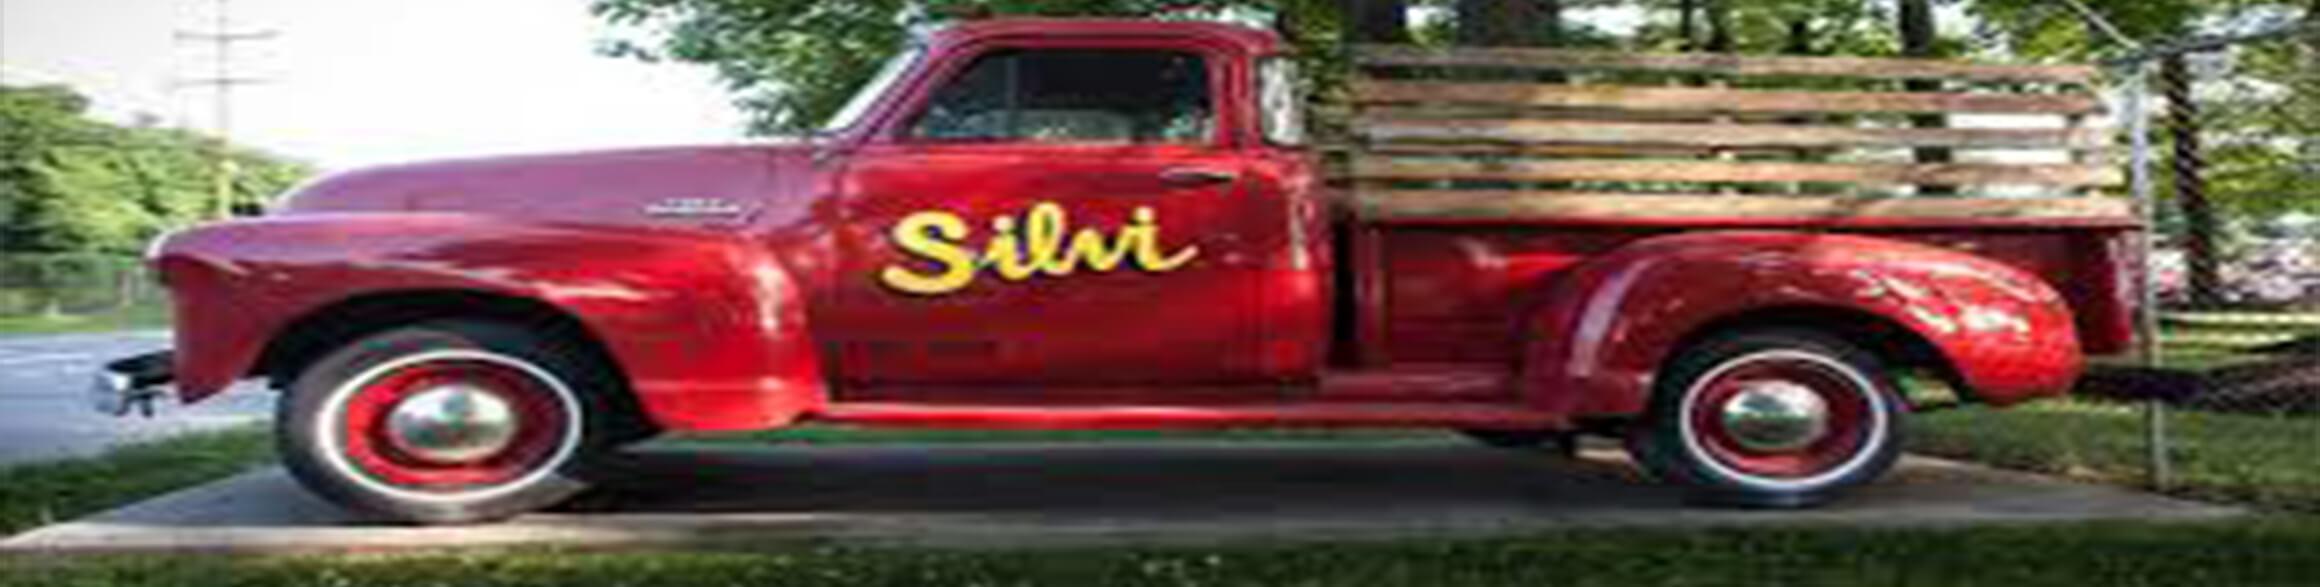 Silva Truck Theme